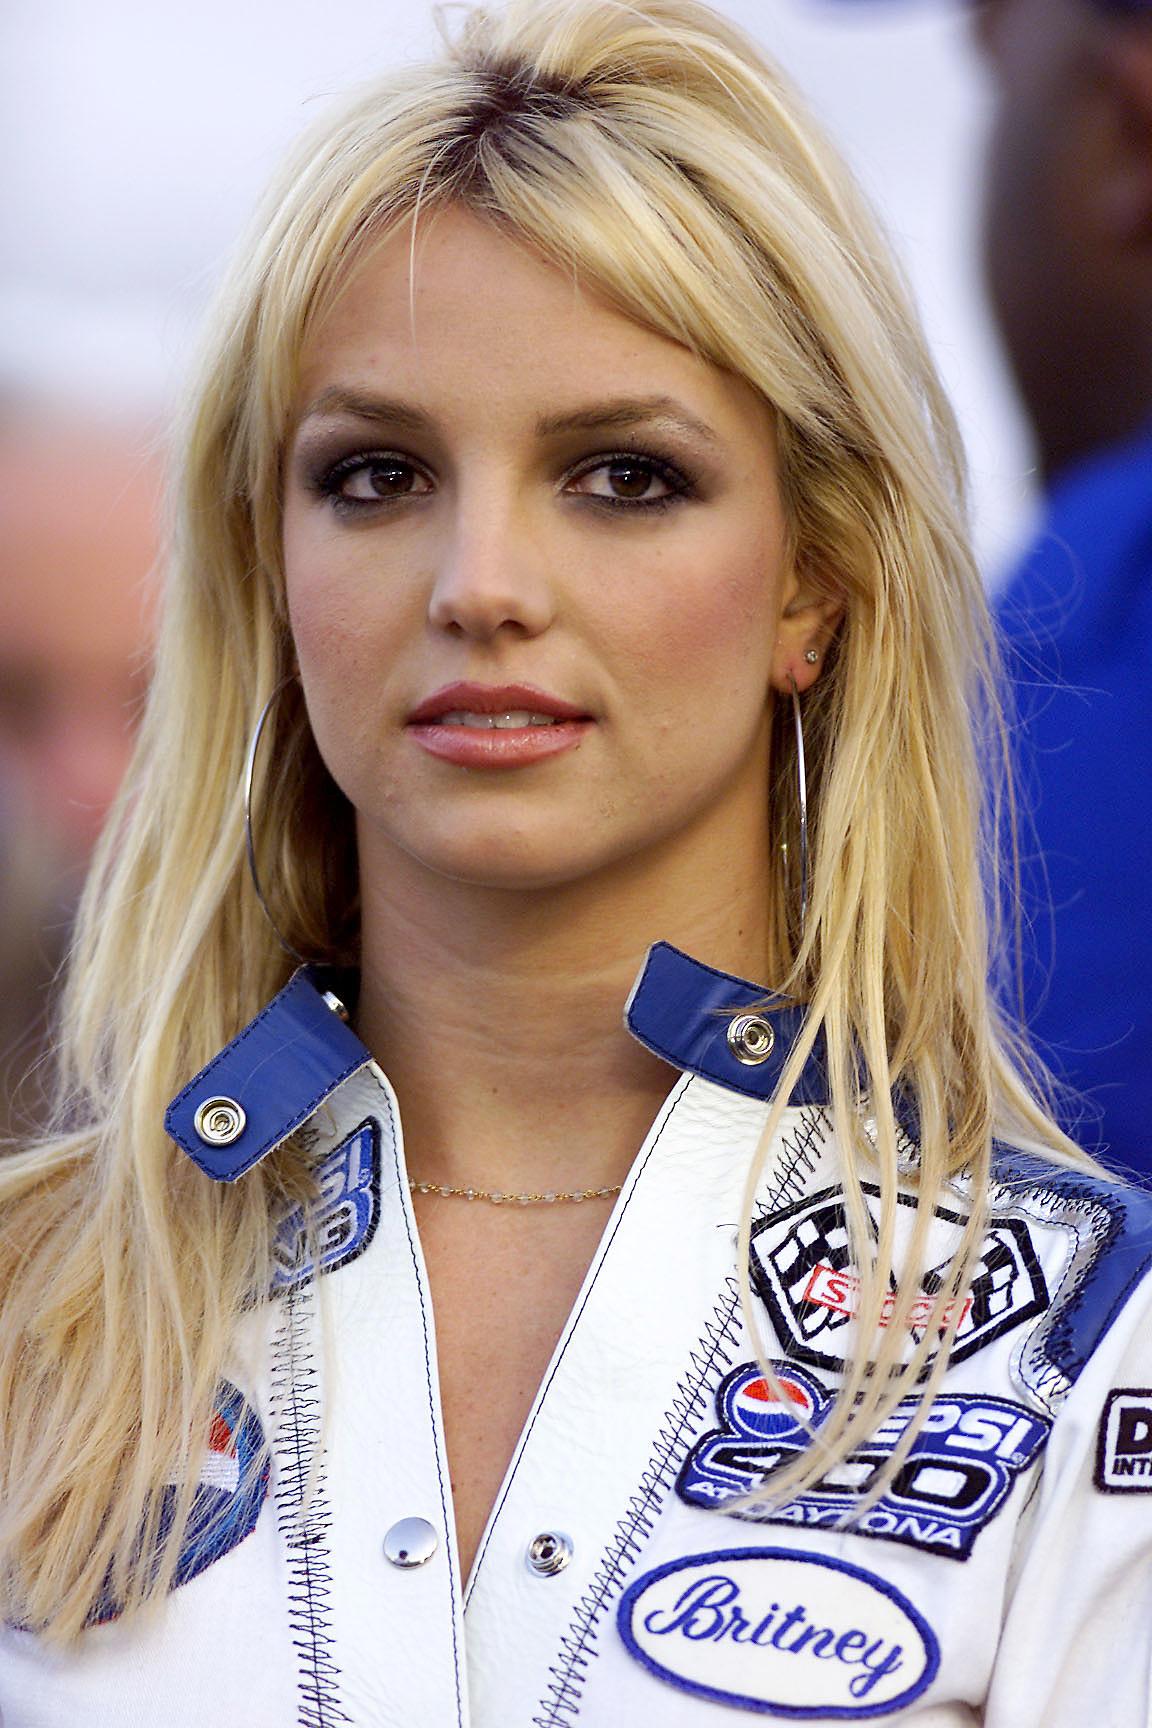 7 Jul 2001: Singer Britney Spears as Grand Marshal  during the NASCAR Winston Cup Pepsi 400 at the Daytona International Speedway, Daytona, Florida. Digital Image. Mandatory Credit: Donald Miralle/ALLSPORT